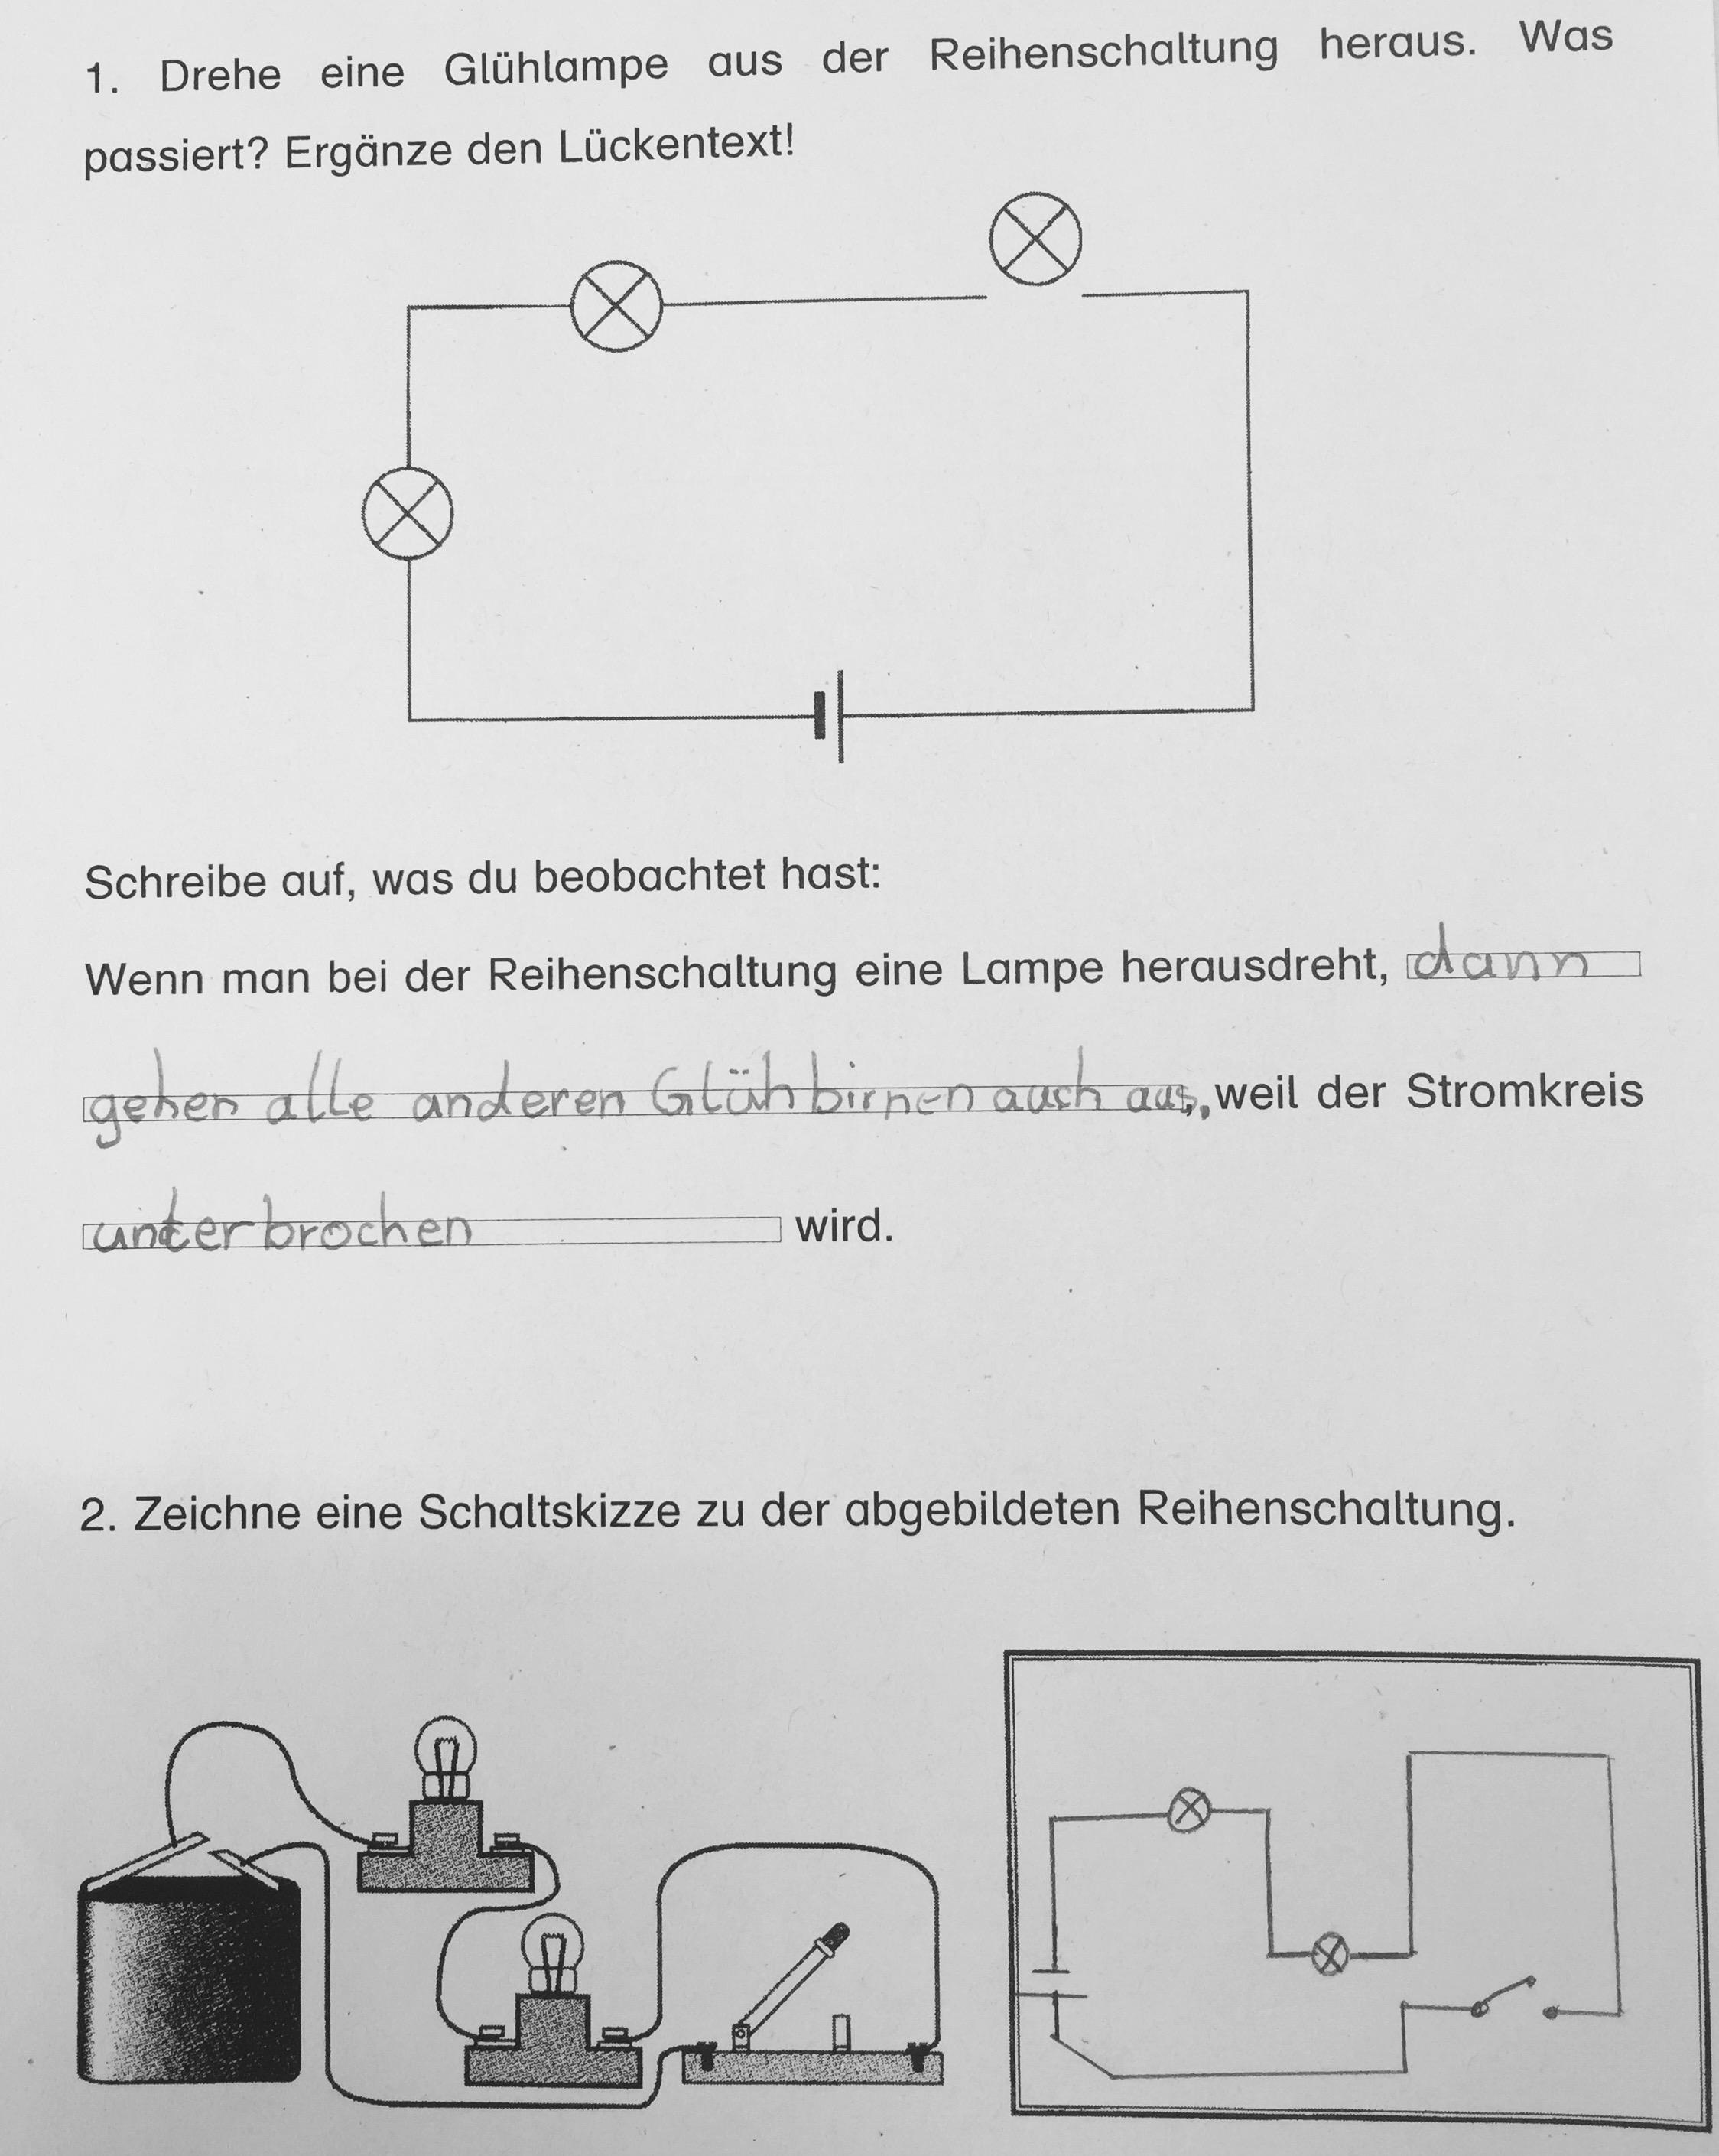 reihenschaltung parallelschaltung grundschule lichtschalter beschriftung. Black Bedroom Furniture Sets. Home Design Ideas